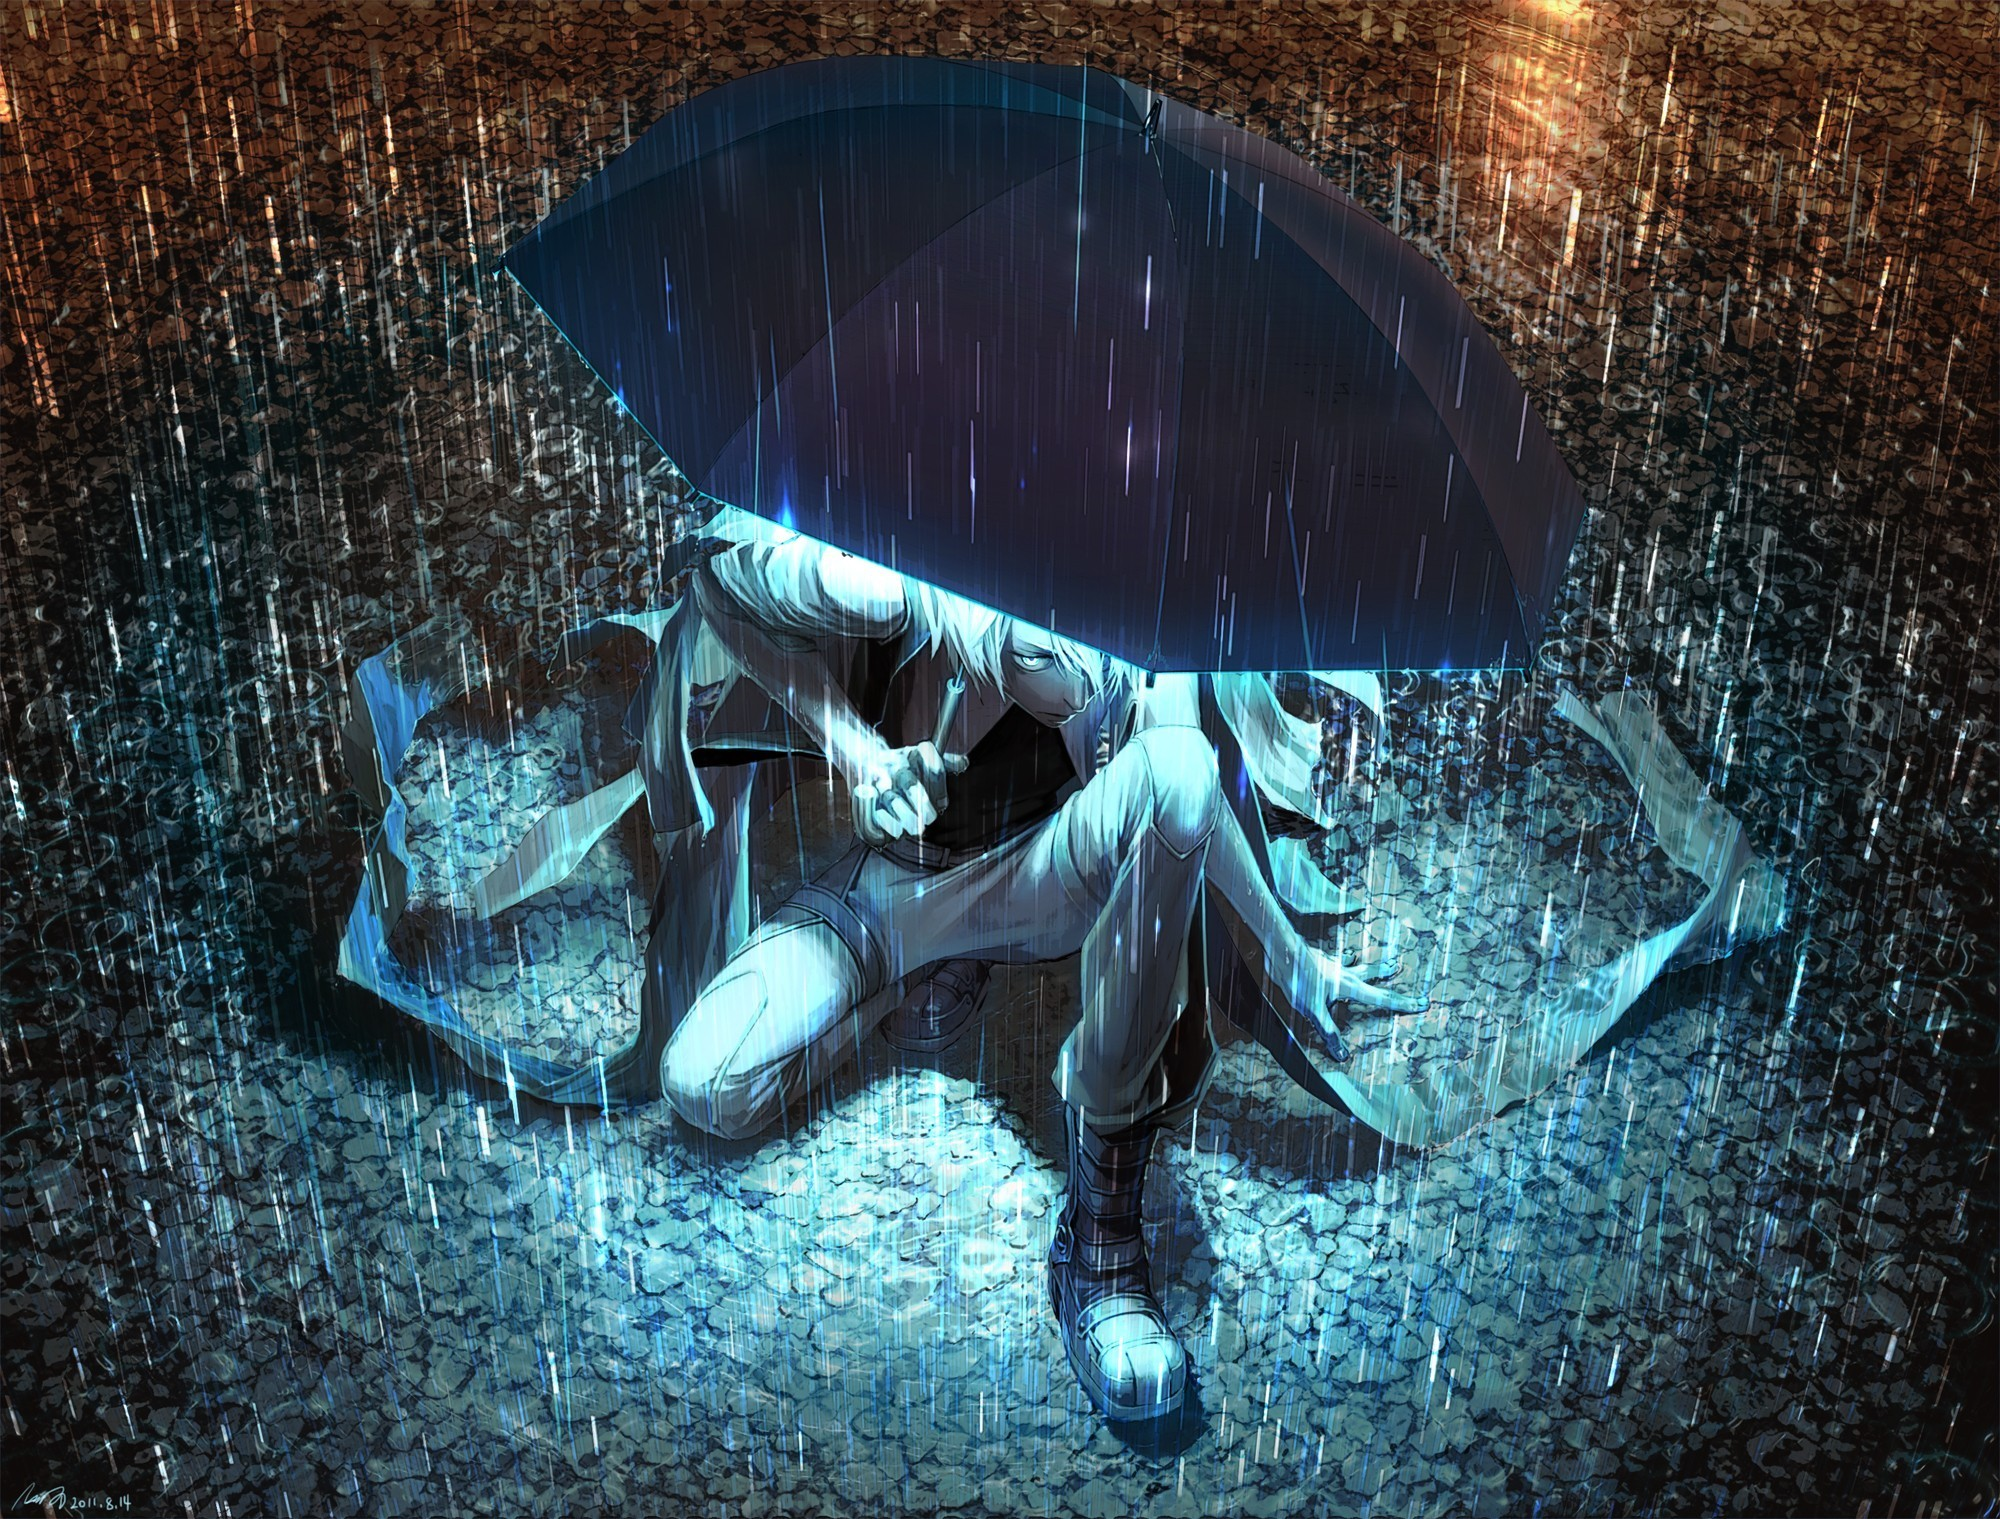 Umbrellas Anime Rain · anime artwork makoto shinkai the garden of words